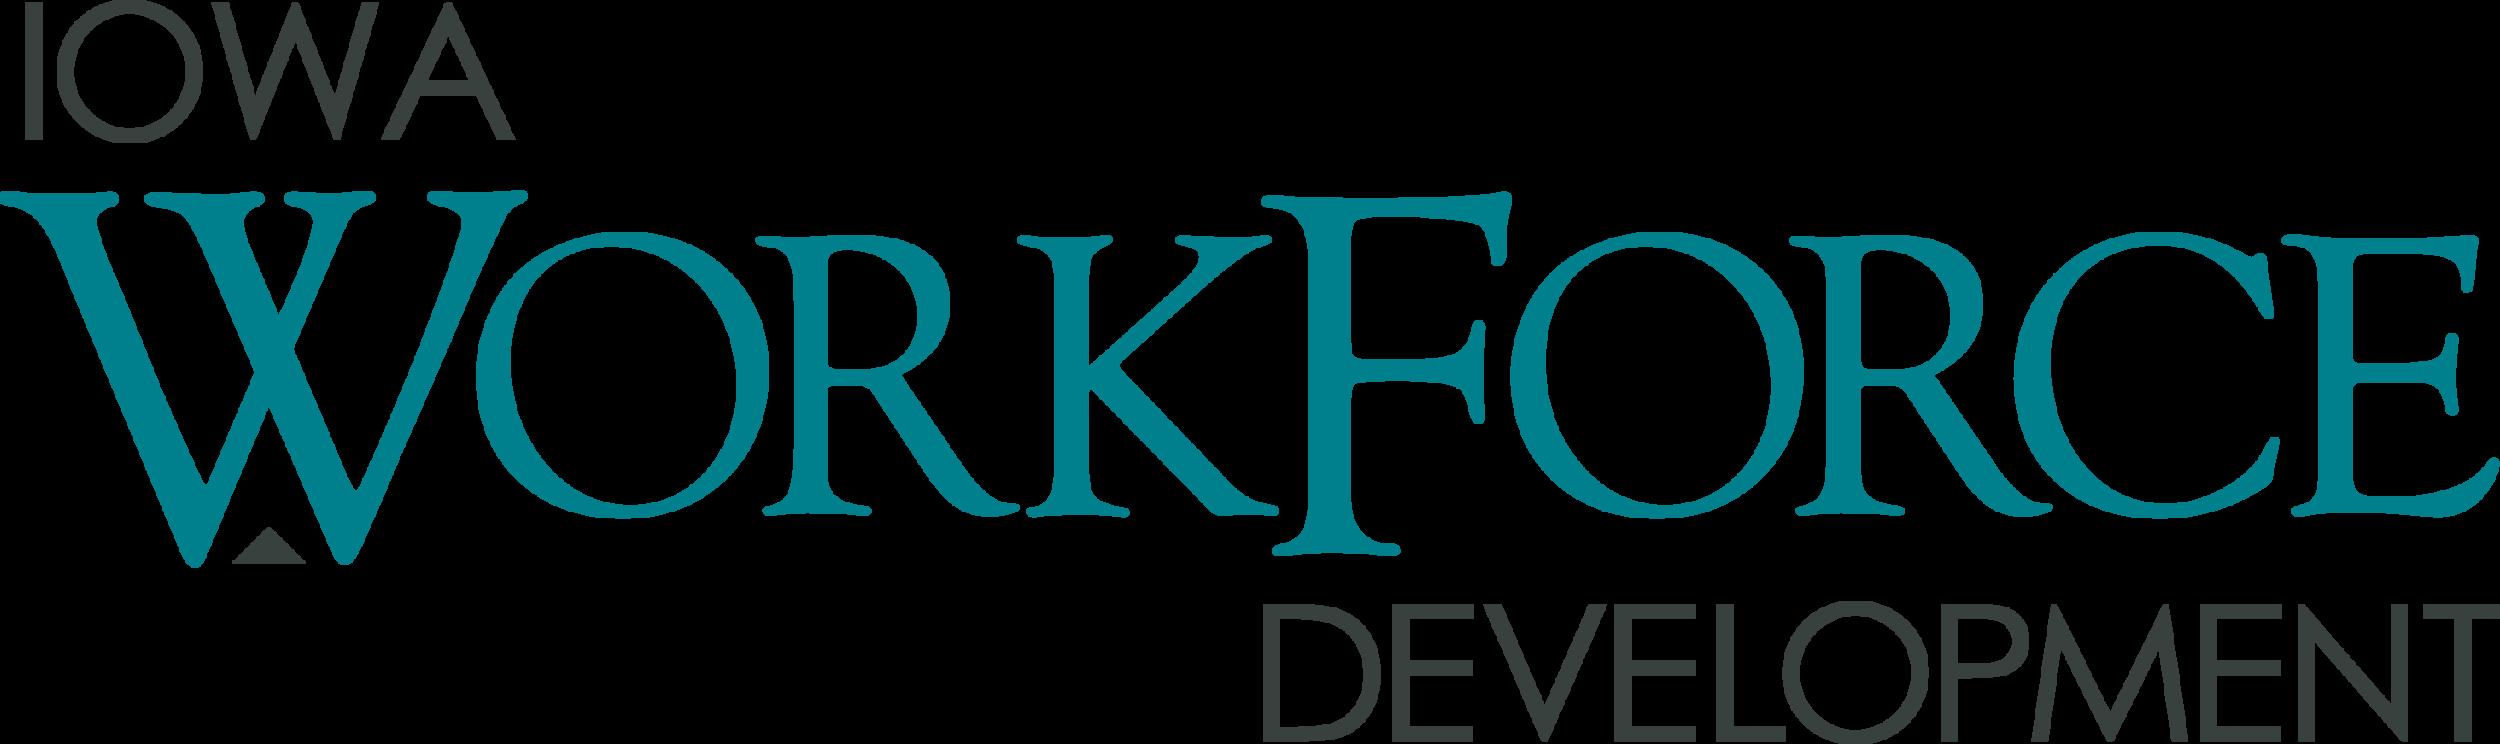 Iowa Workforce Development.png